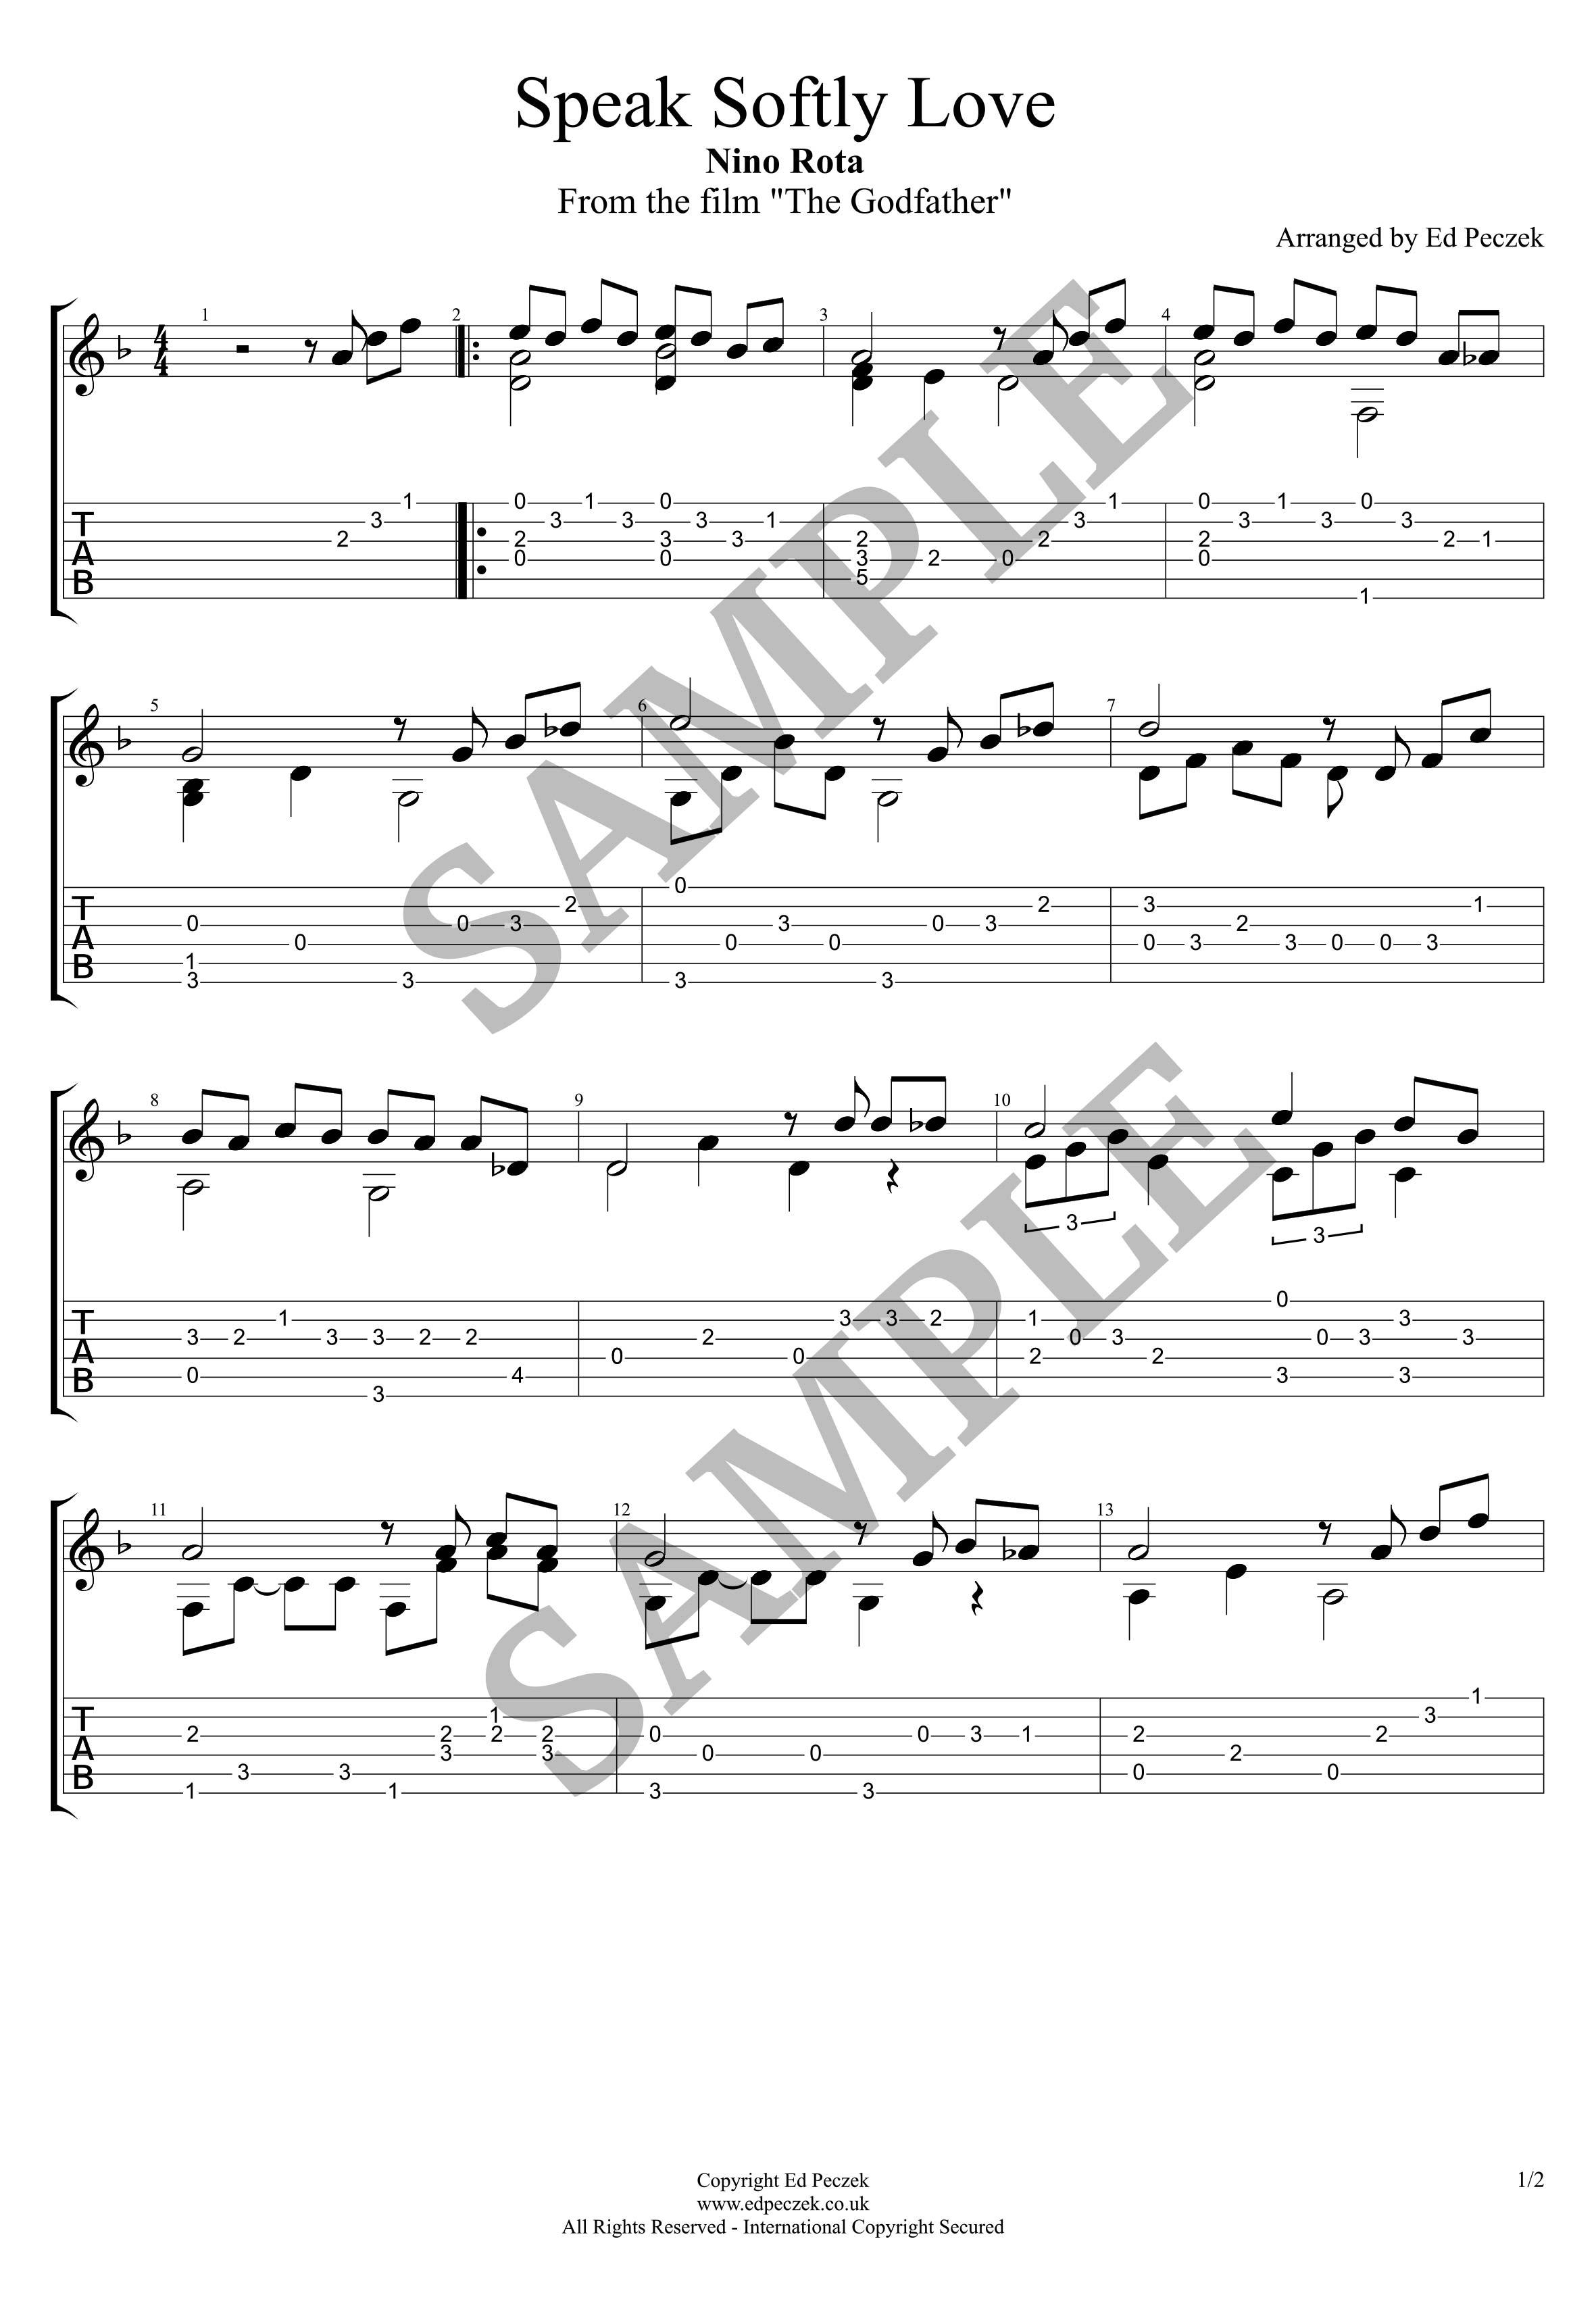 Speak Softly Love Notation Guitar Tab Wedding Guitarist